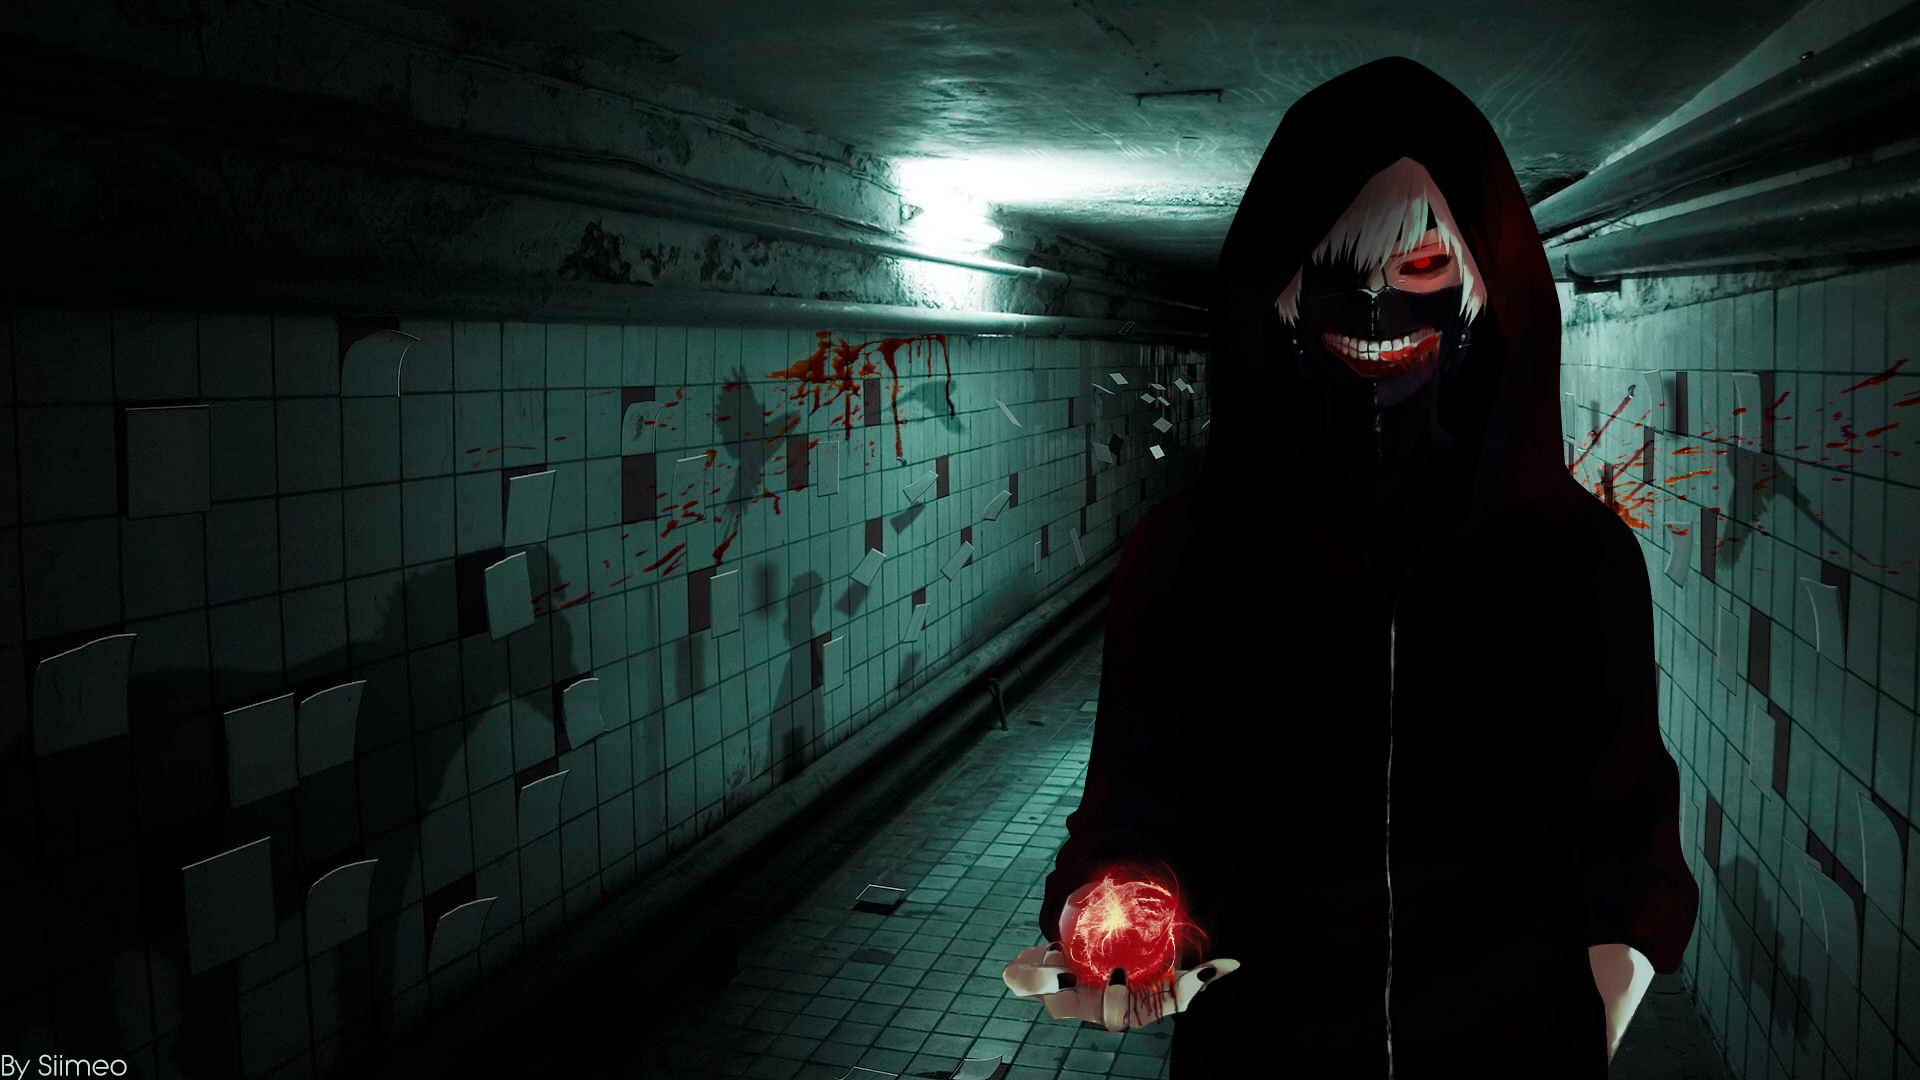 Tokyo Ghoul Re Wallpaper 83 Images